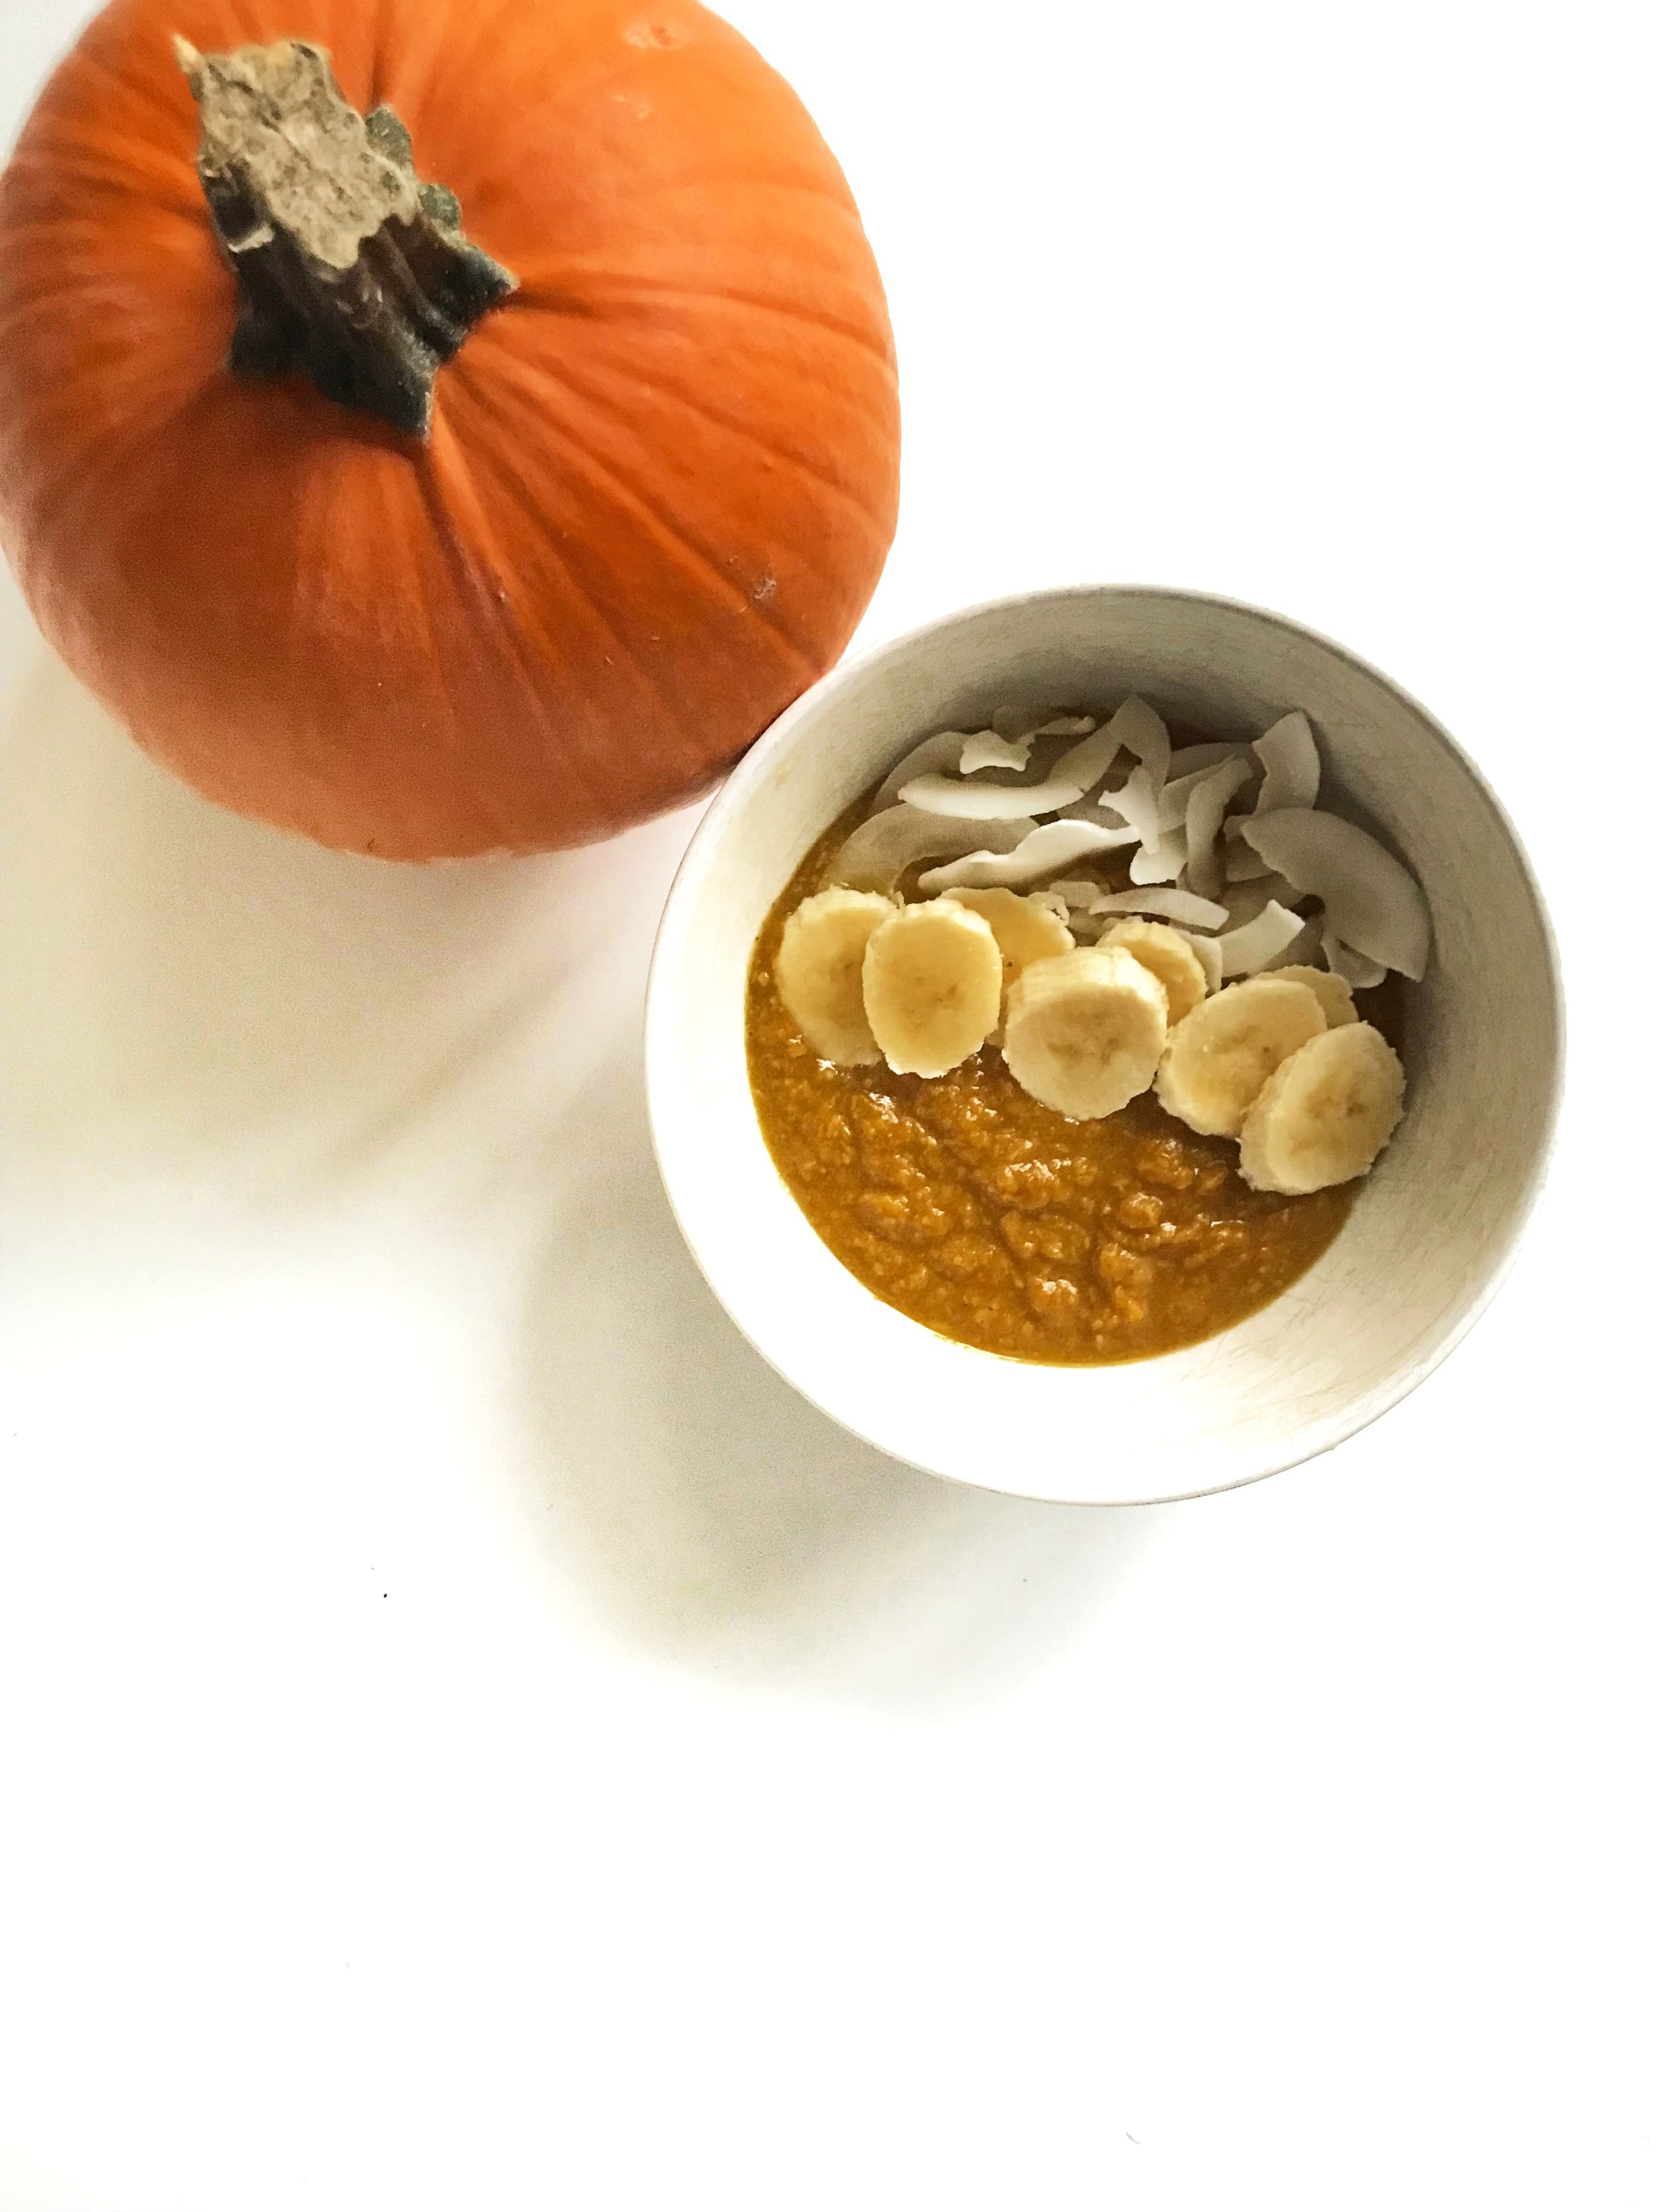 Paleo Pumpkin Porridge (AIP, GAPS, Gluten-Free, Dairy-Free, Breakfast)